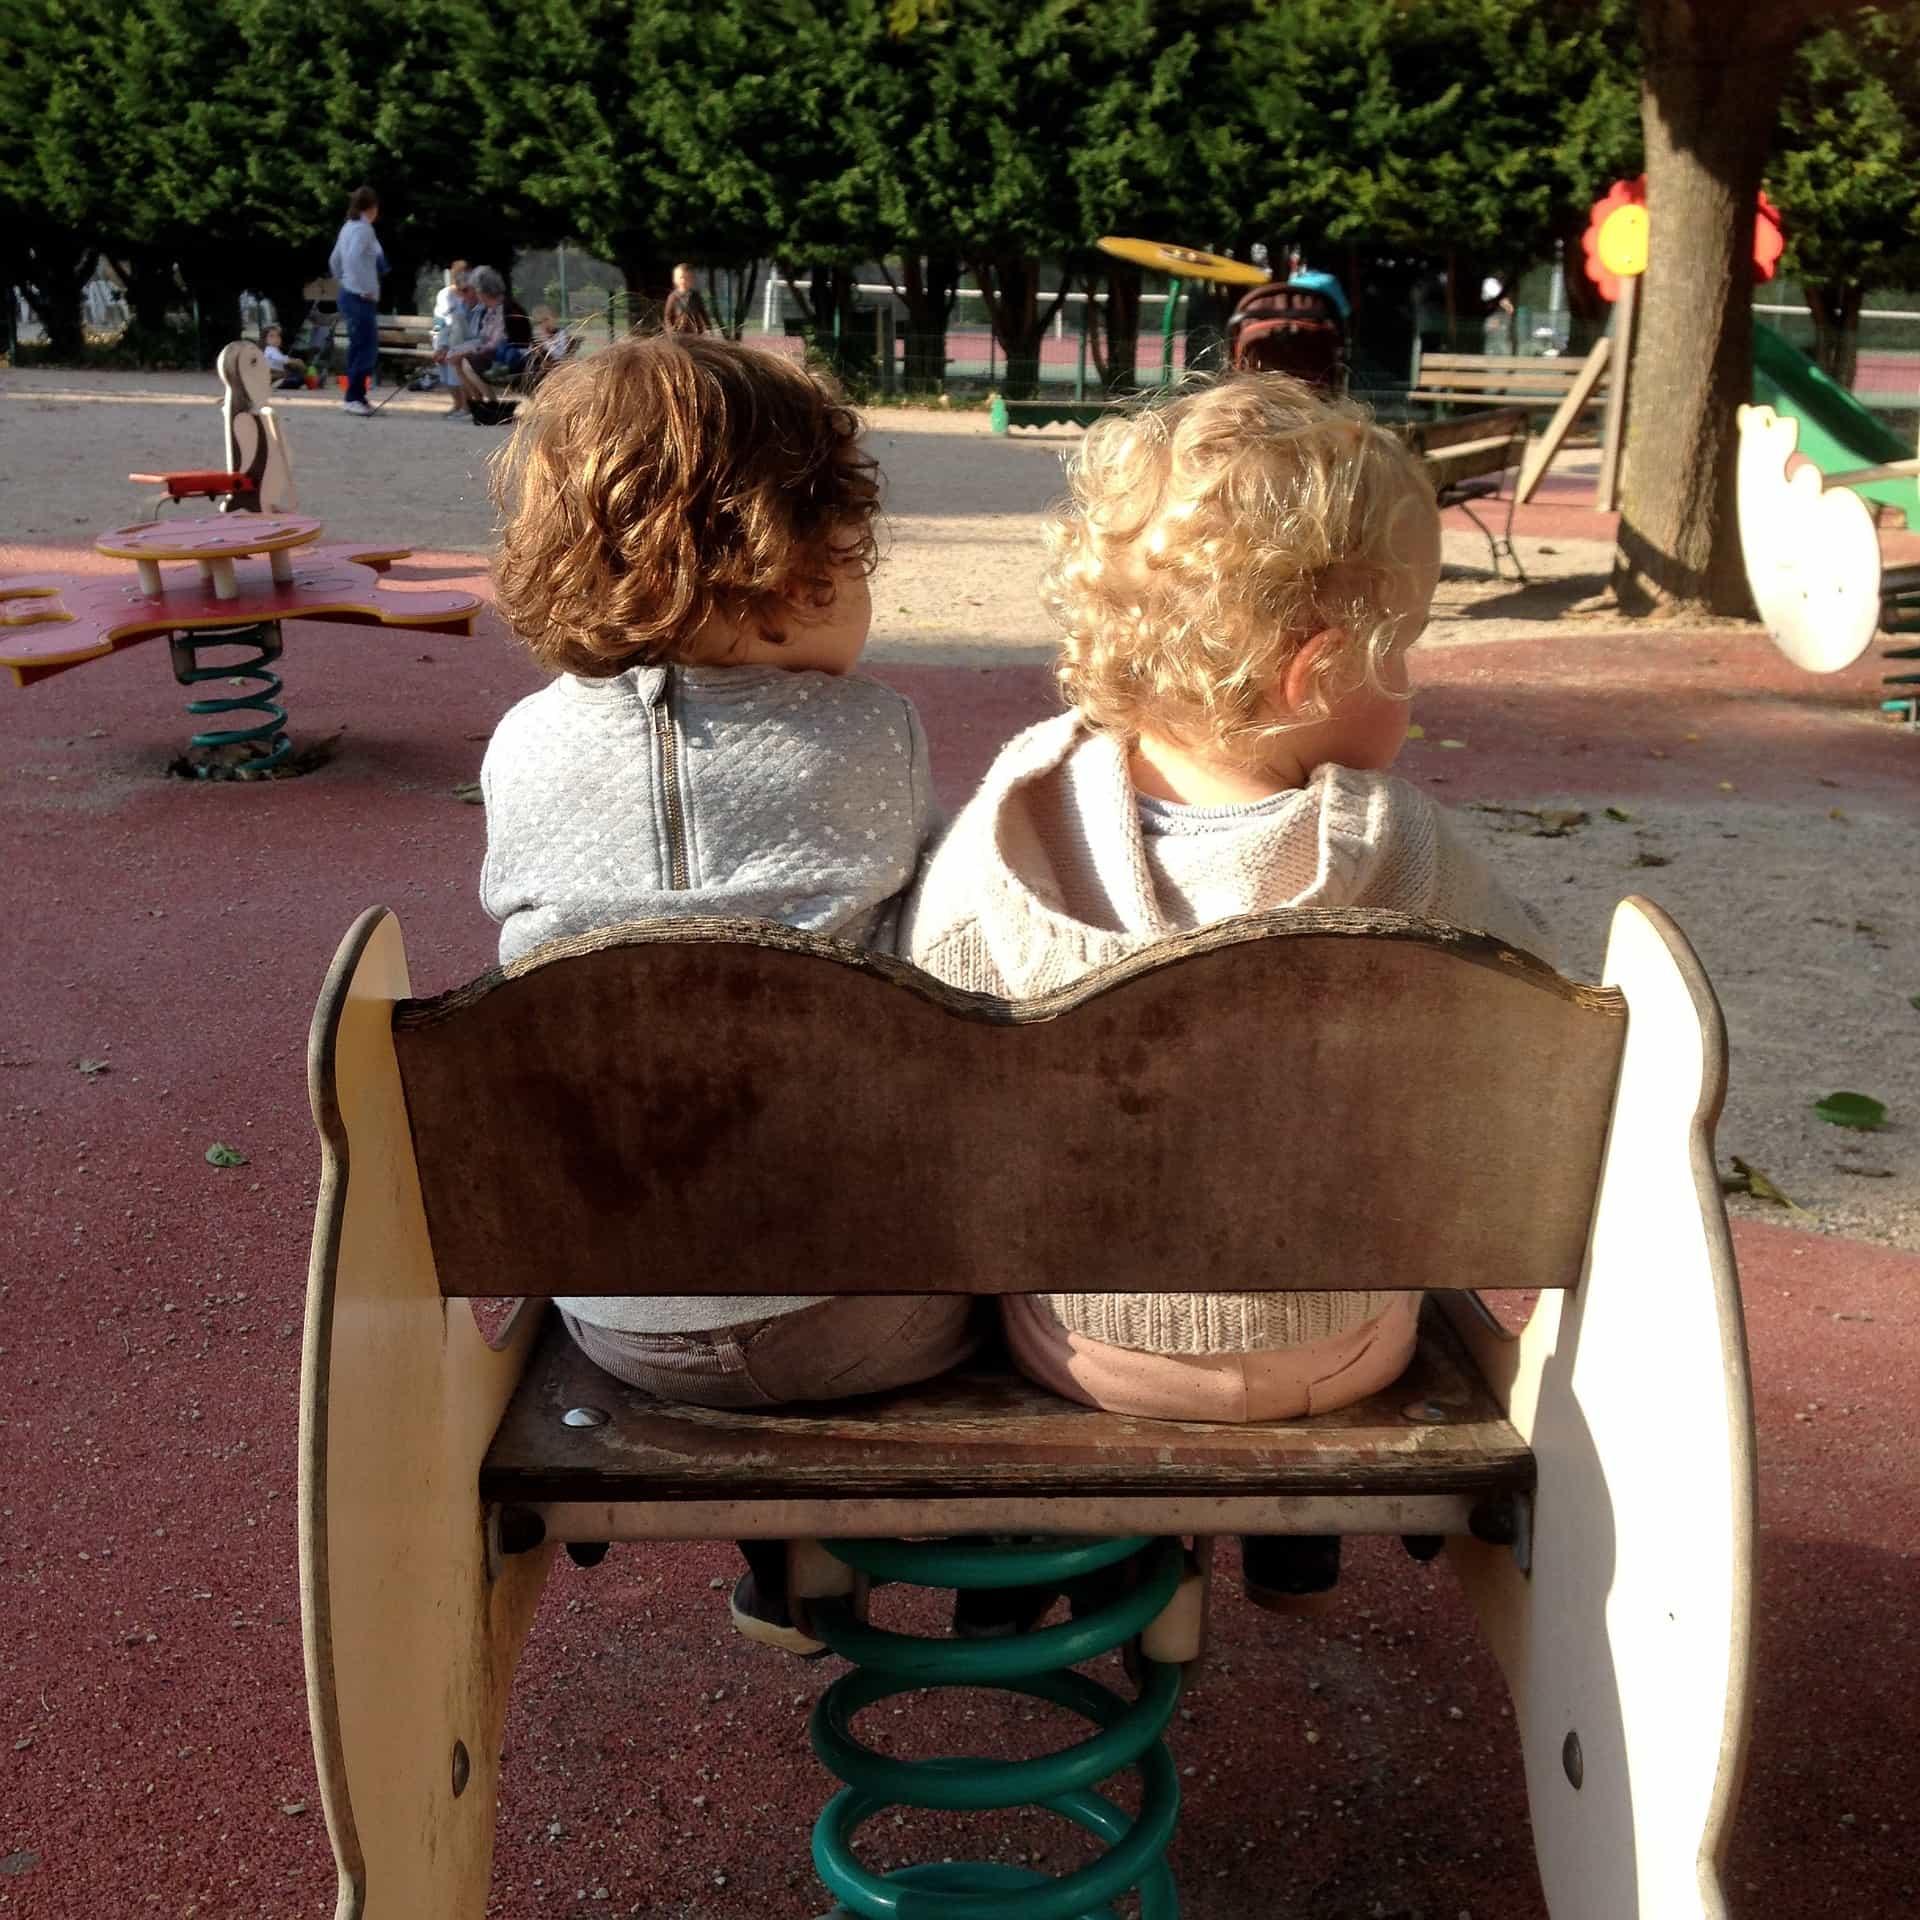 adopted children making friends